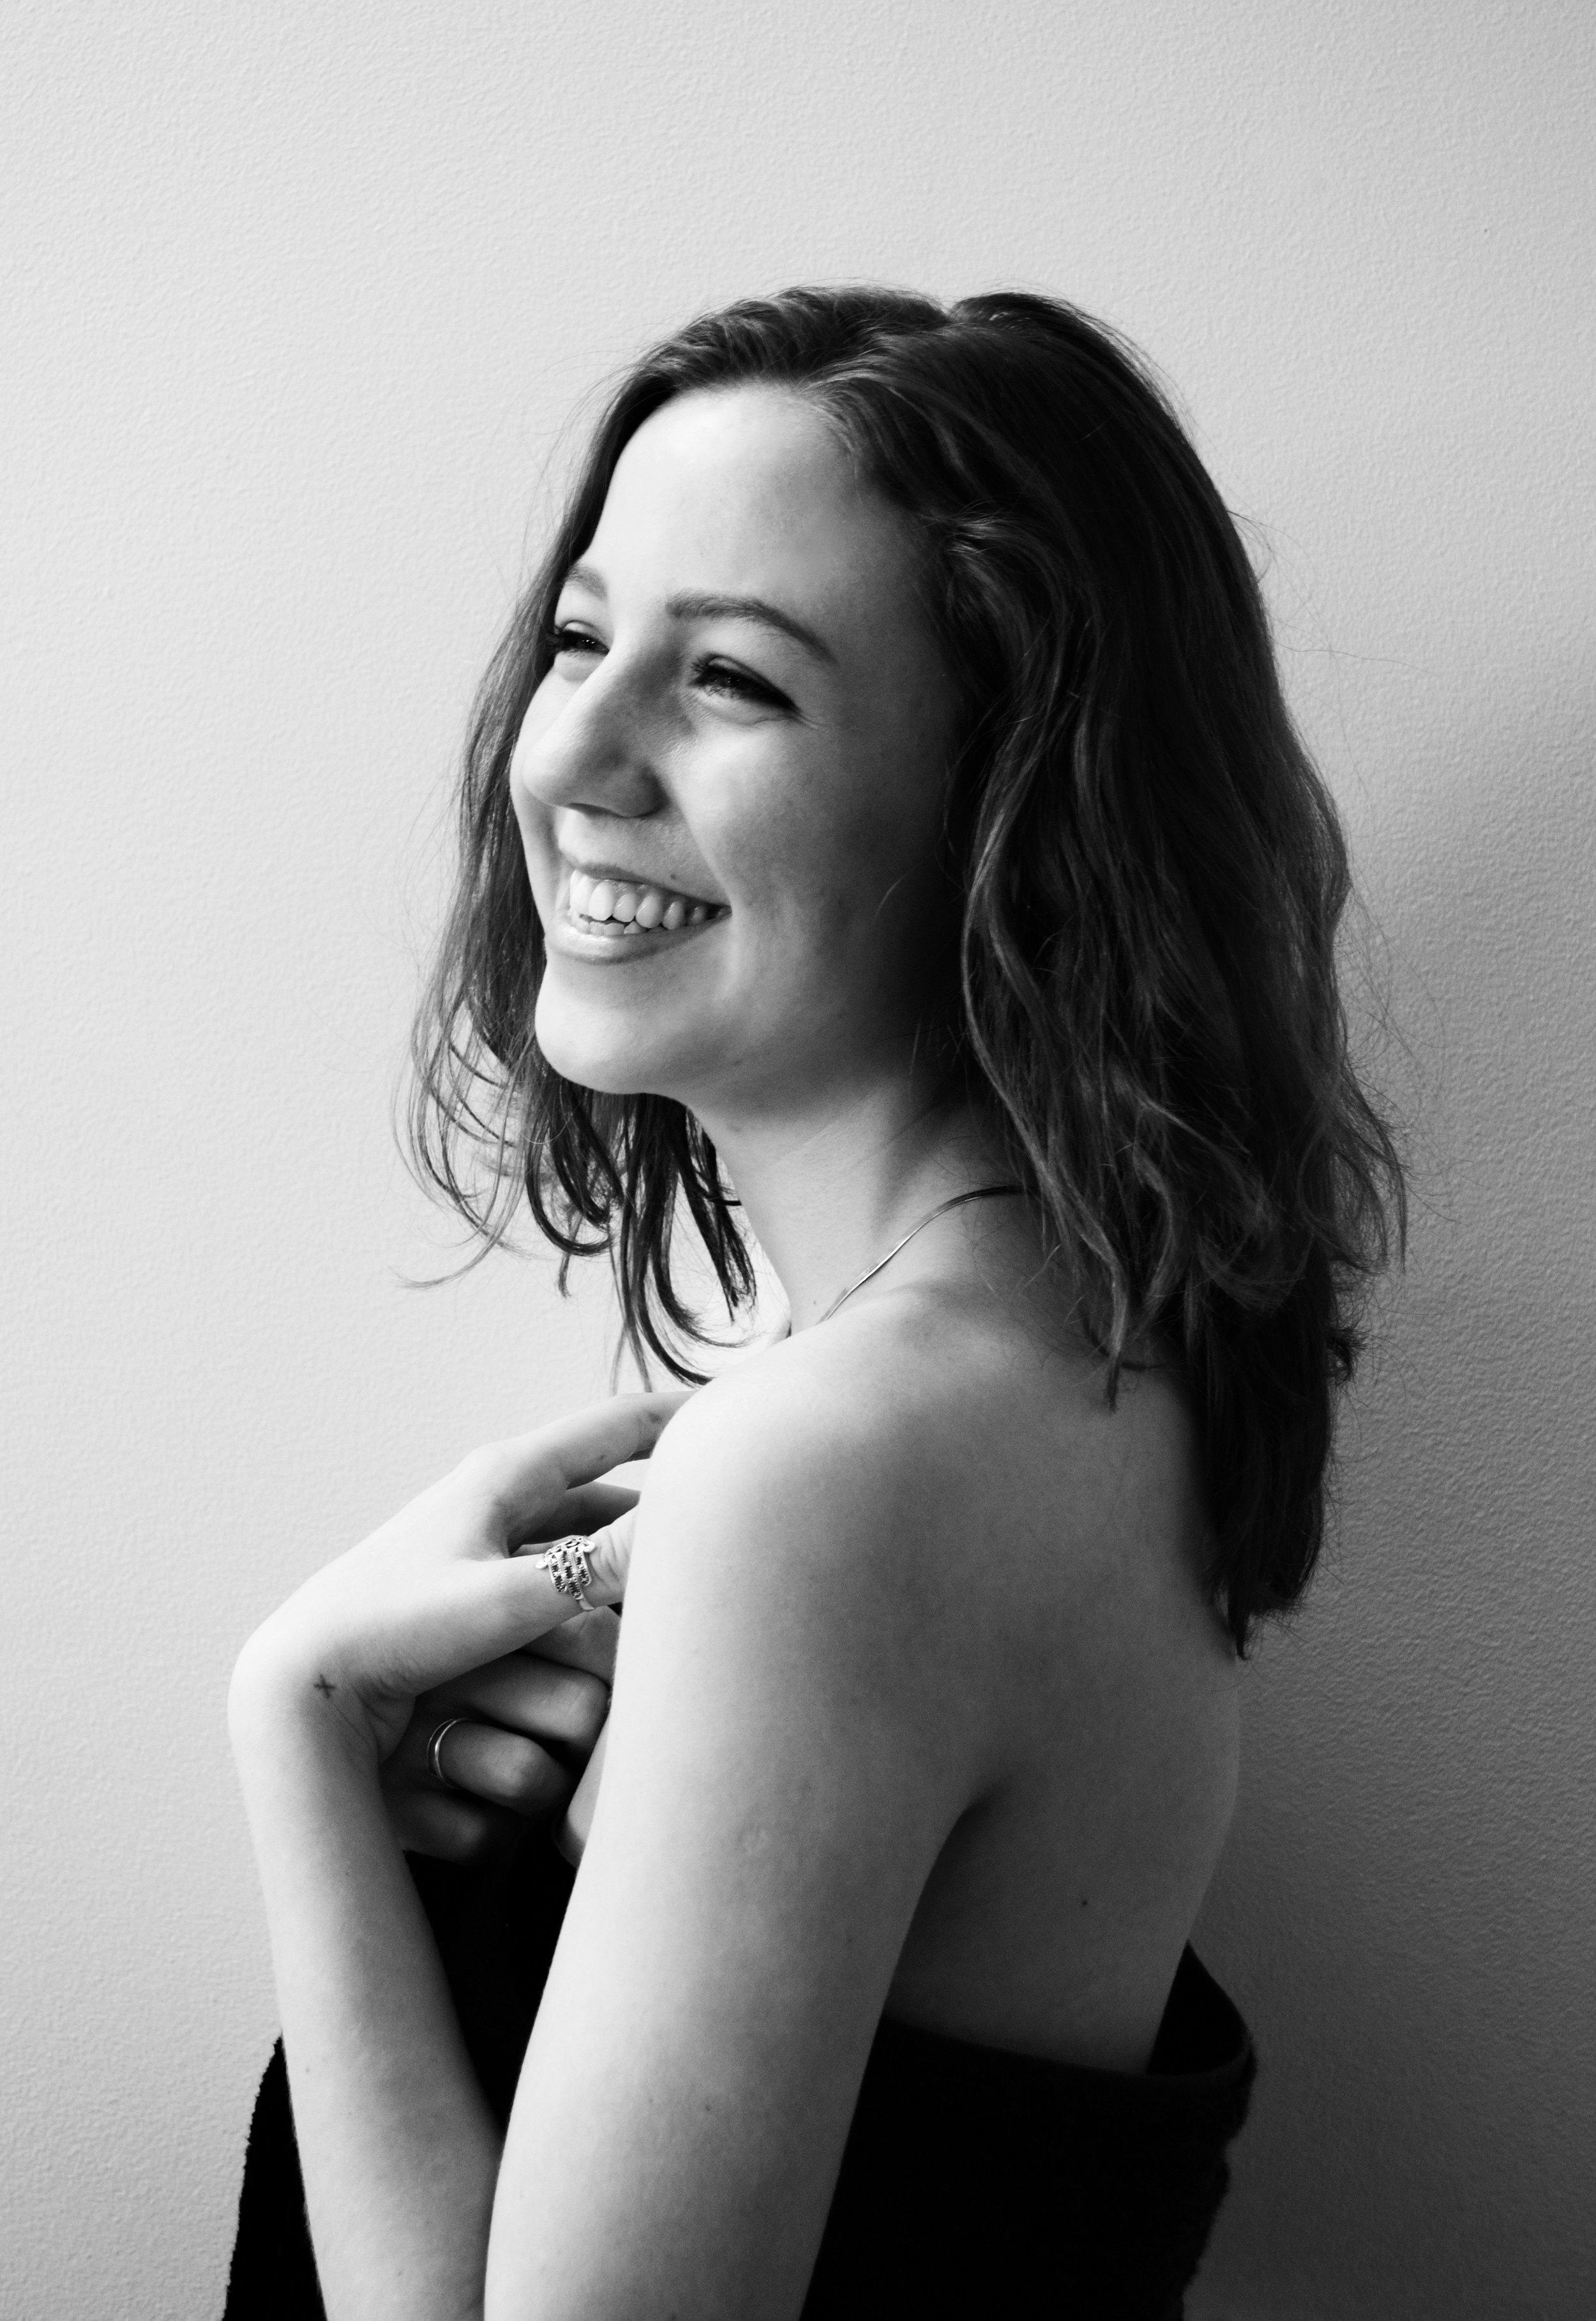 Sofia Zur - Class of 2019